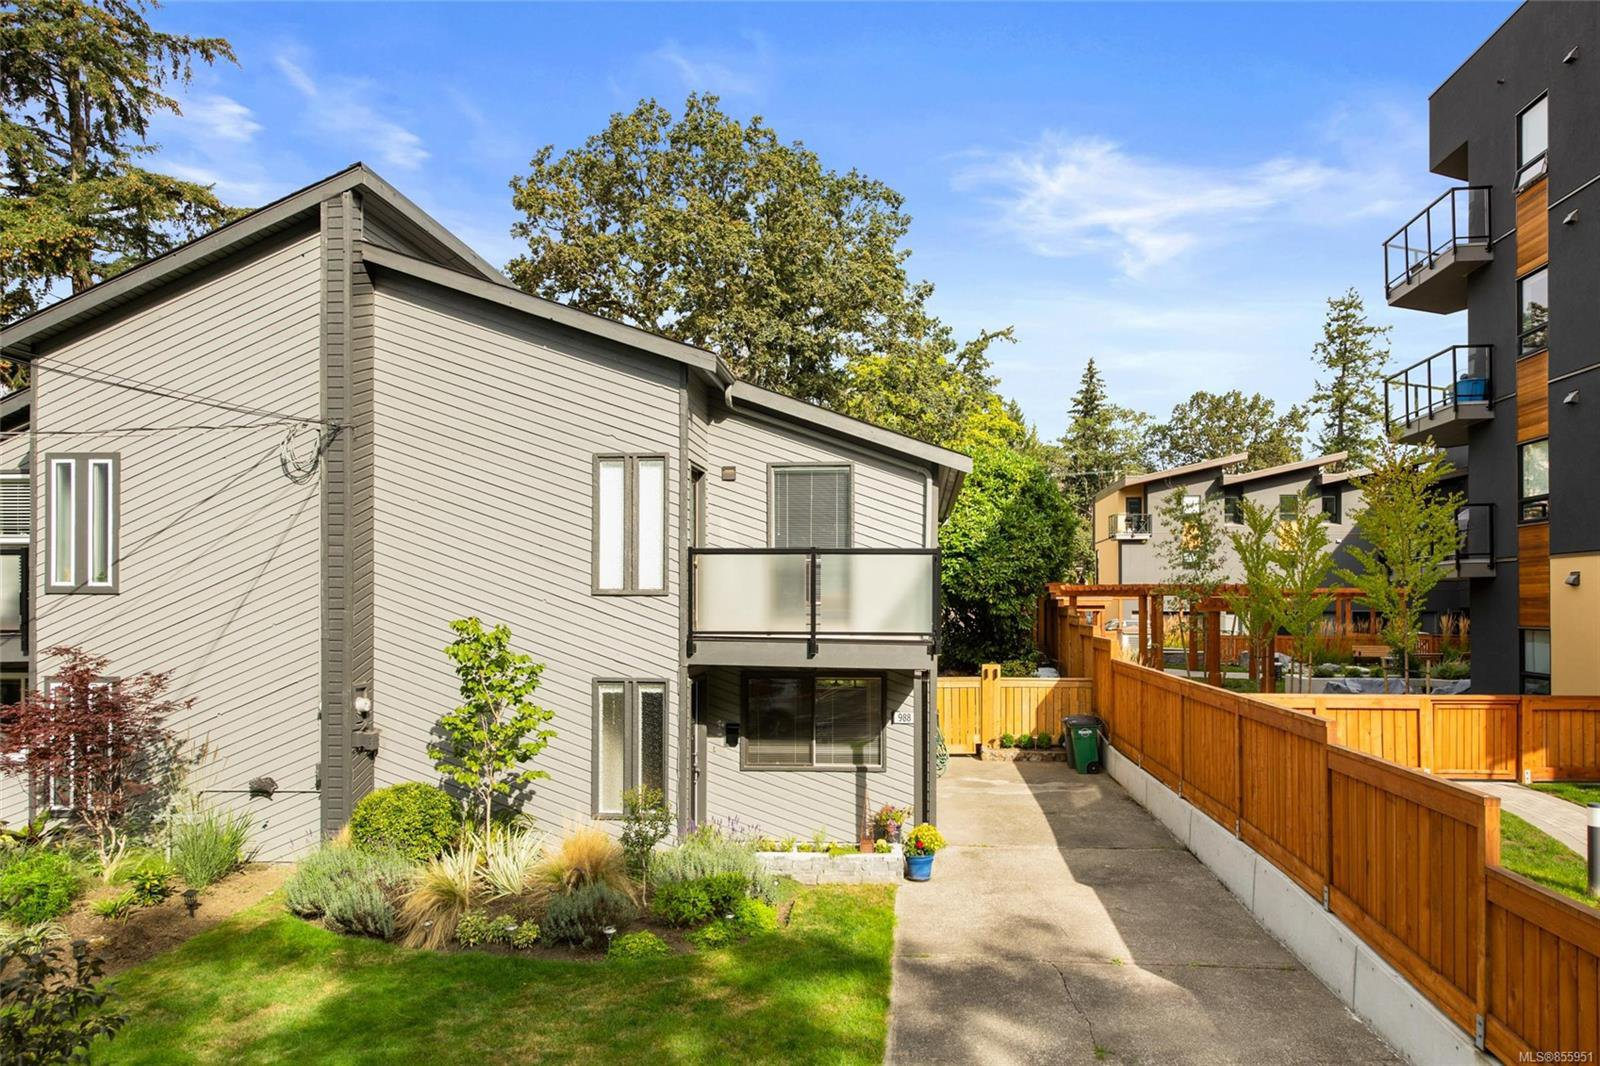 Main Photo: 988 Annie St in : SE Quadra Half Duplex for sale (Saanich East)  : MLS®# 855951